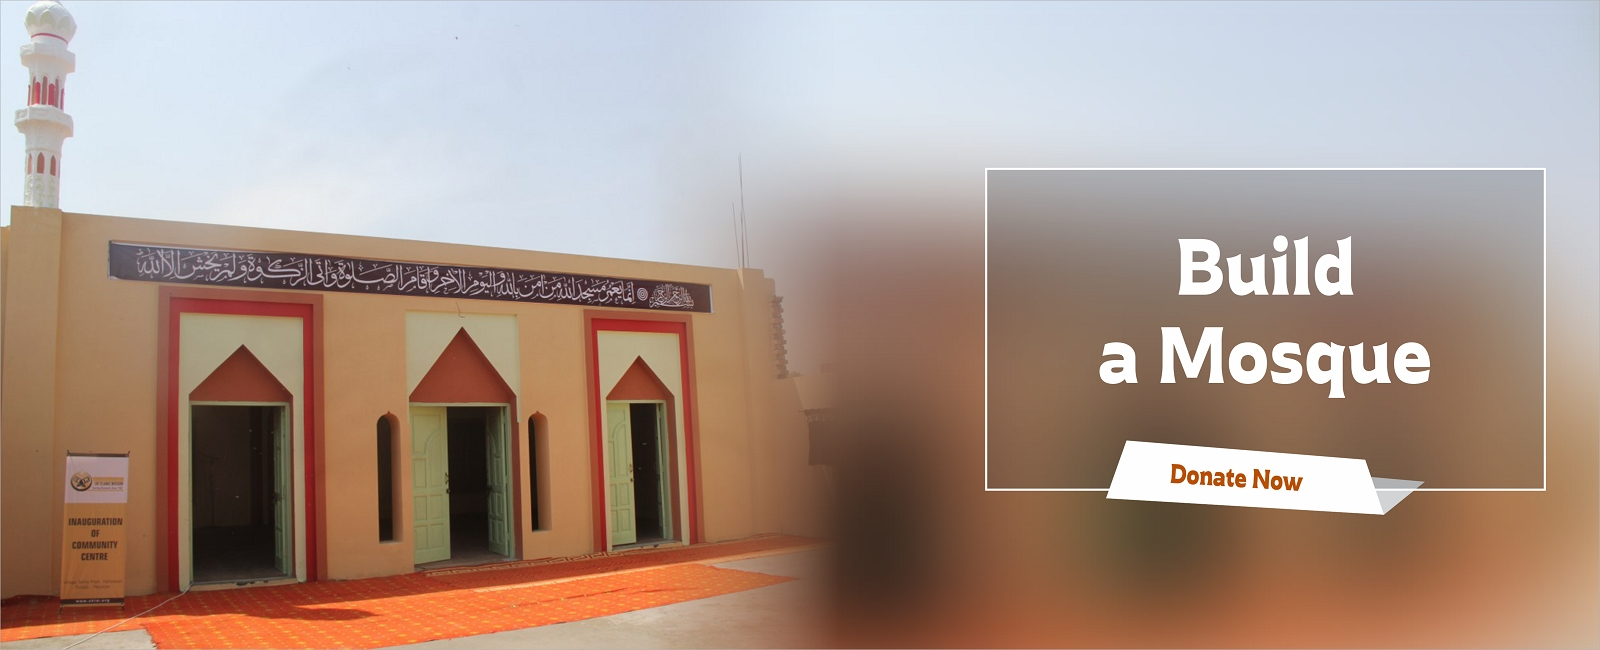 Build-A-Mosque